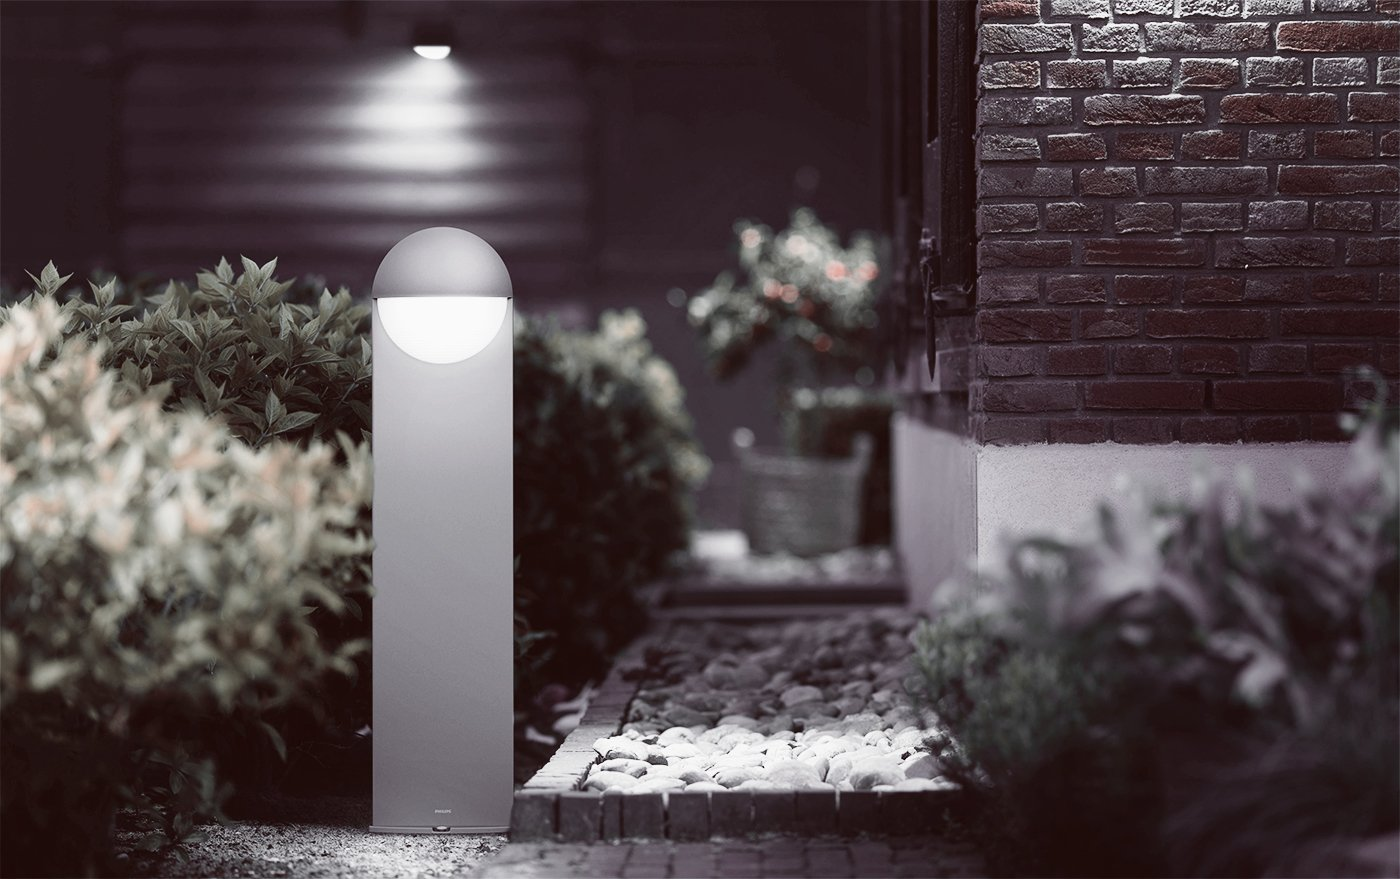 Philips Hue Outdoor Lampen Die Richtigen Lichtszenen Fur Die